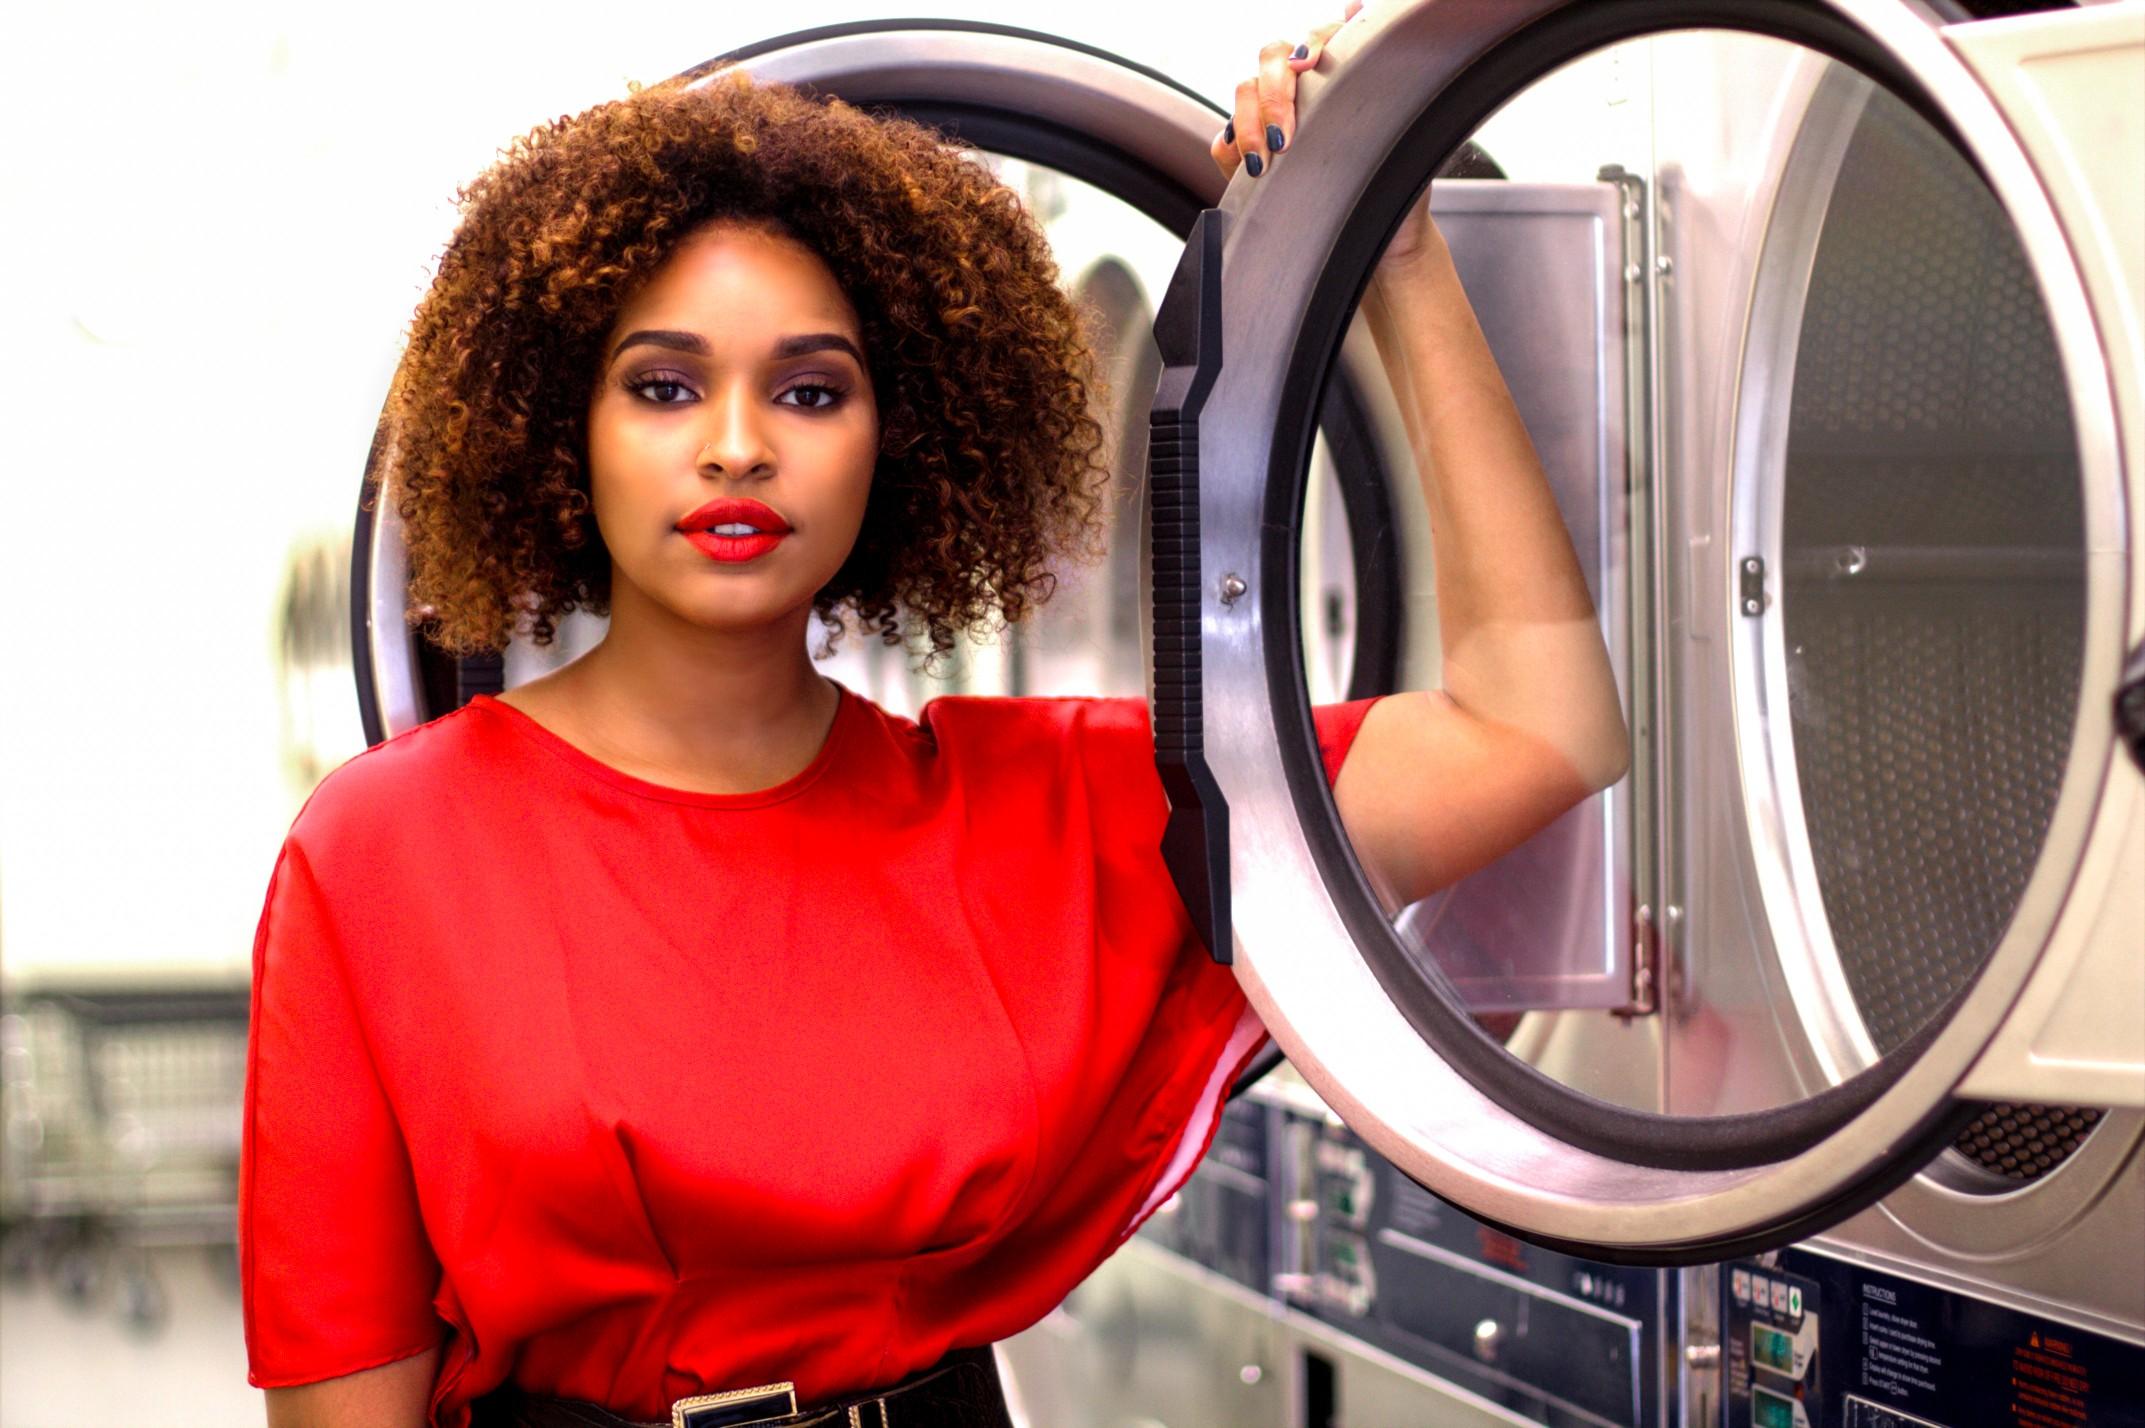 Blogger Laundromat Photoshoot